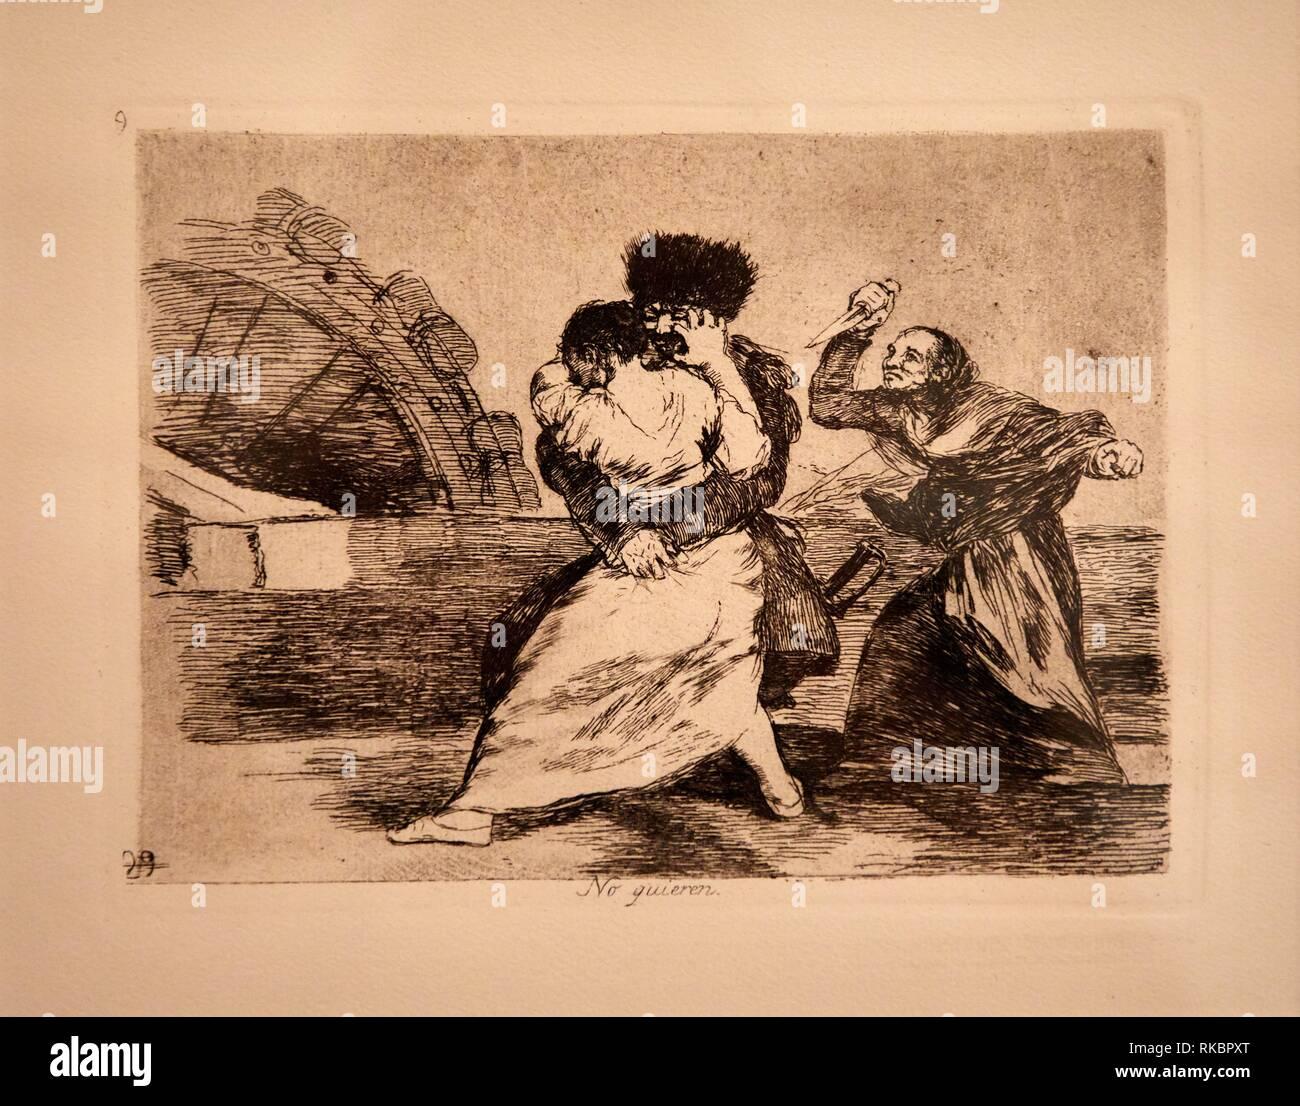 The Disasters of War, Francisco de Goya, Museo Nacional Centro de Arte Reina Sofia, Madrid, Spain, Europe Stock Photo